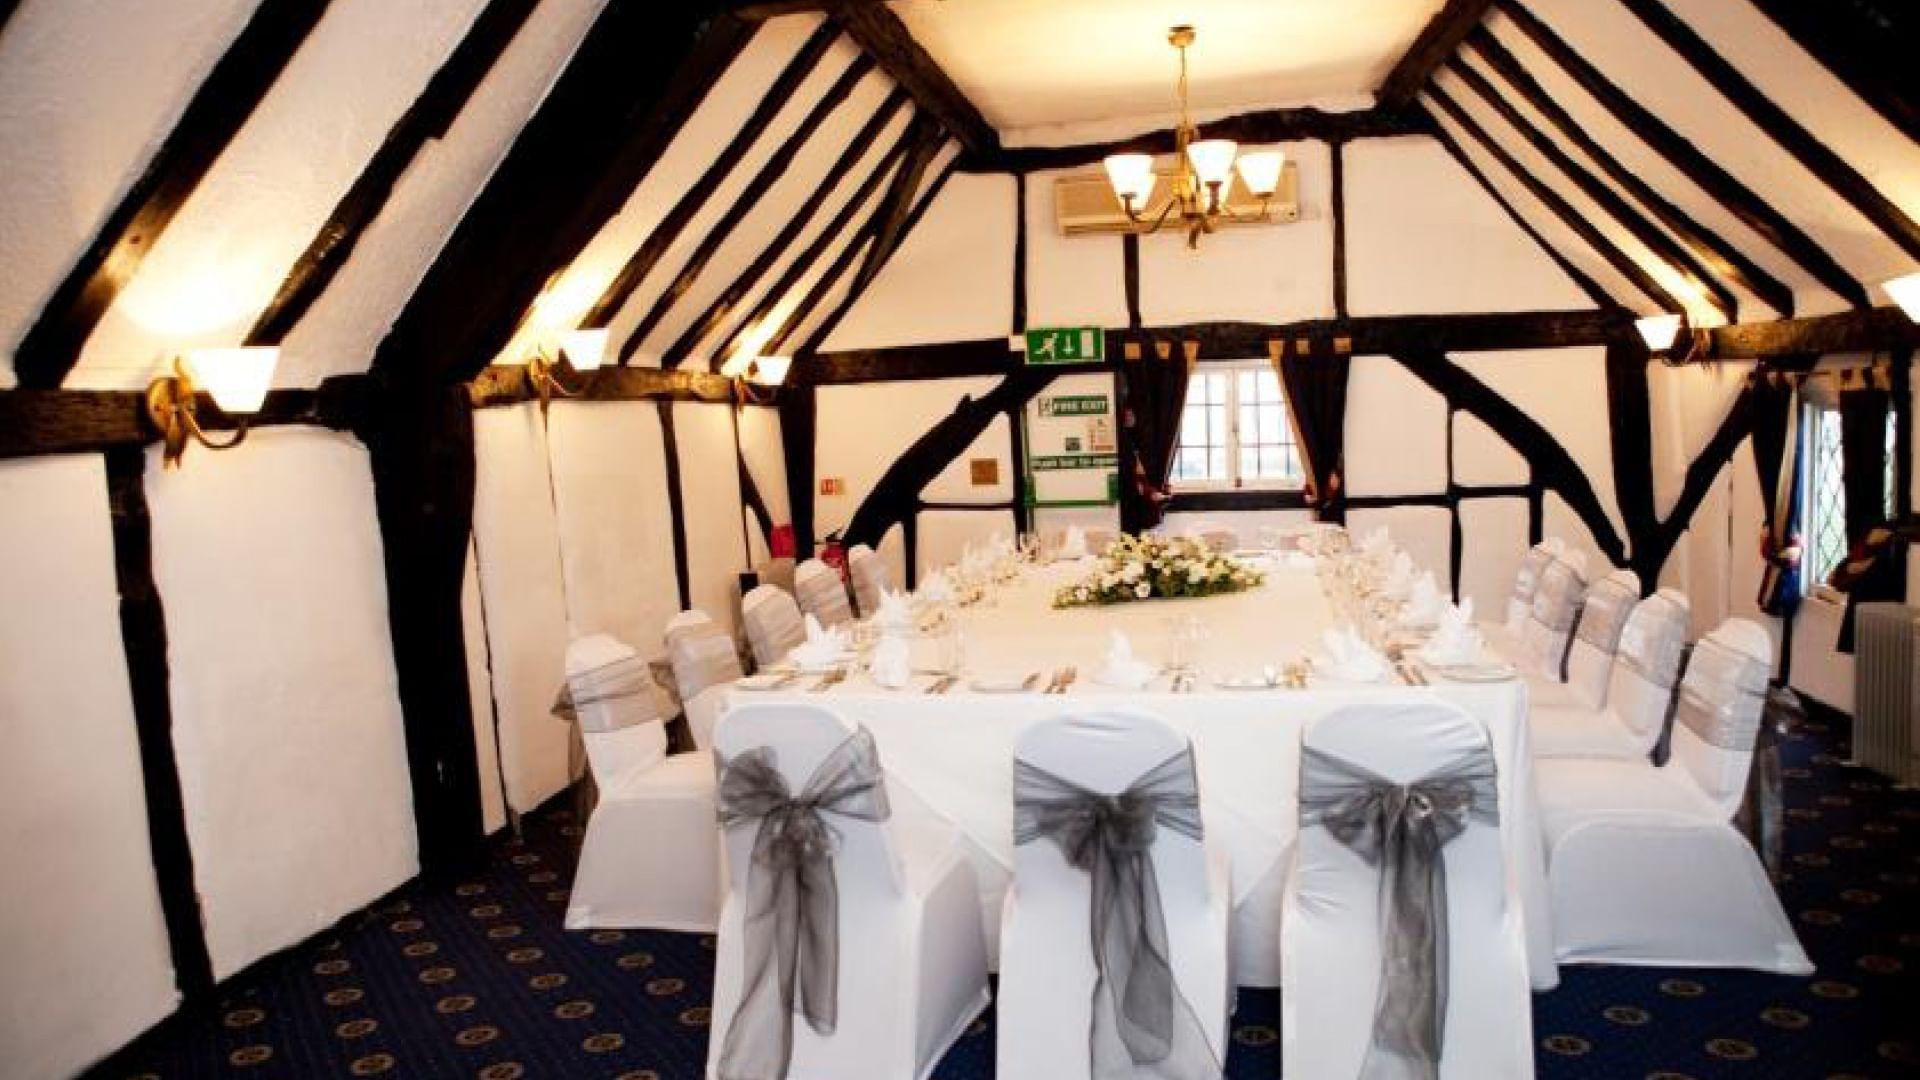 Wedding at The Barn Hotel, Ruislip